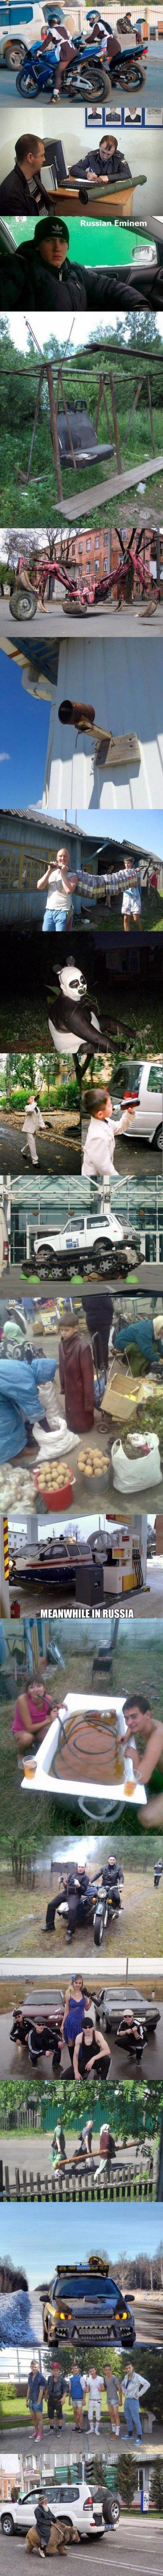 russia. . Ill RUSSIA russia Ill RUSSIA